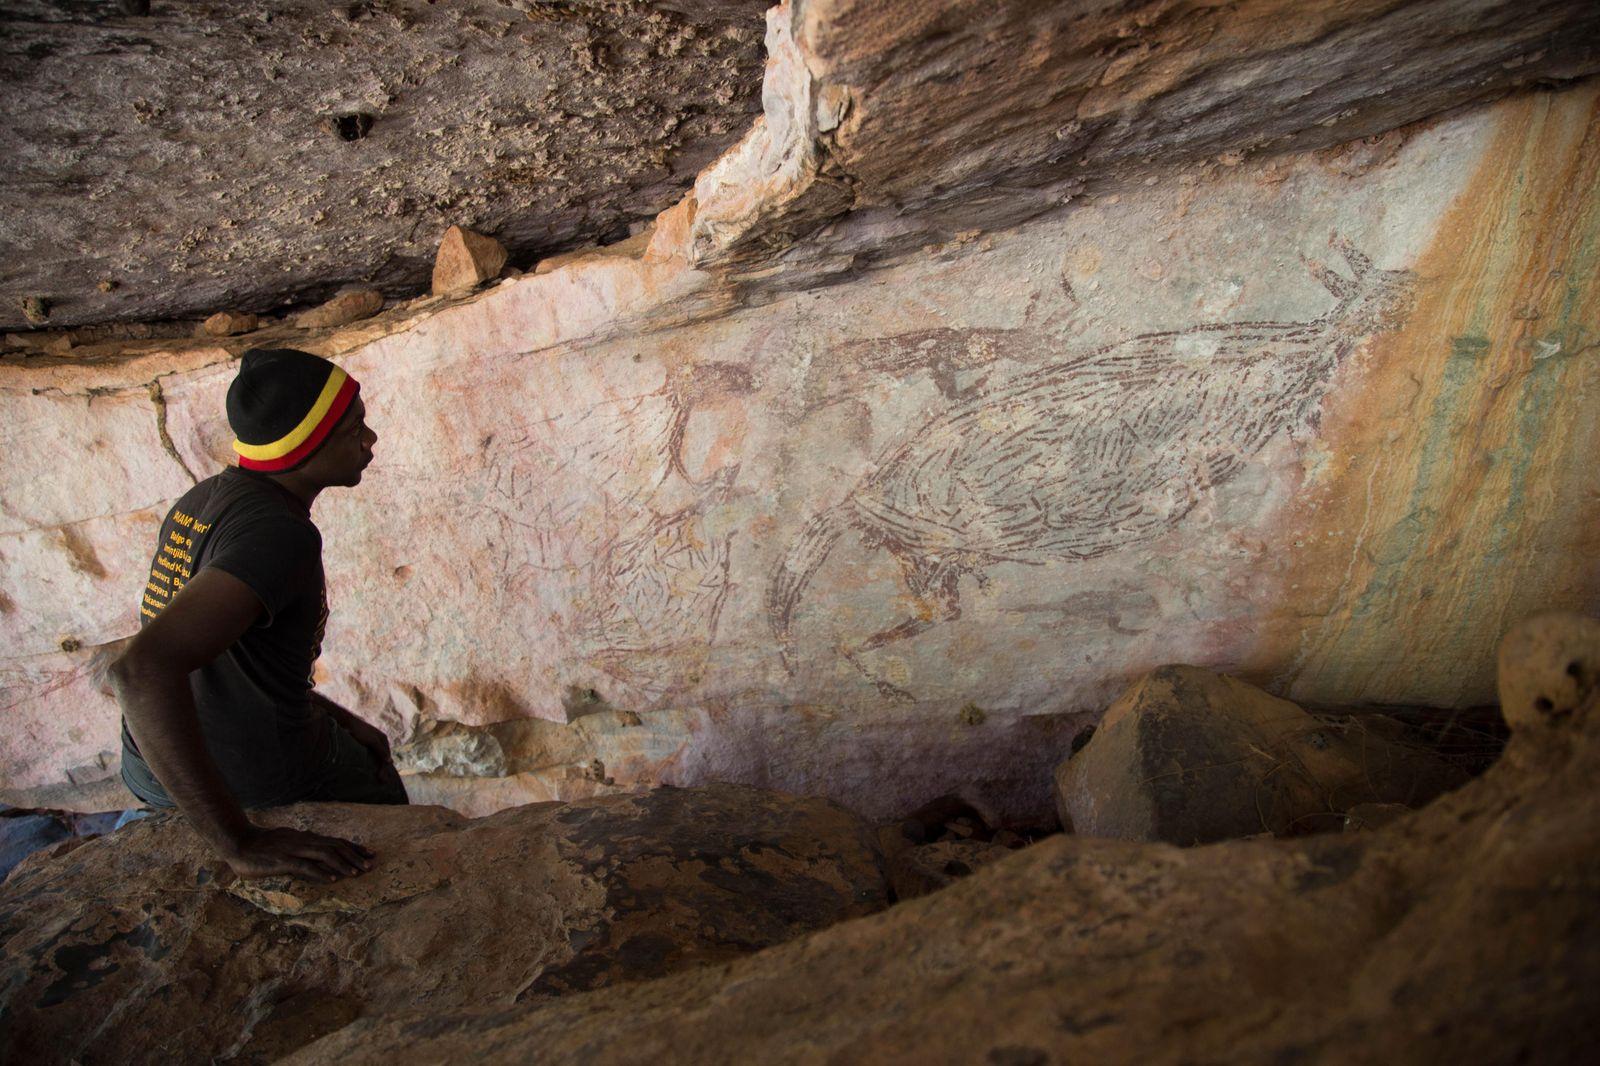 Dossier: Australiens älteste Felsenmalerei zeigt ein Känguru